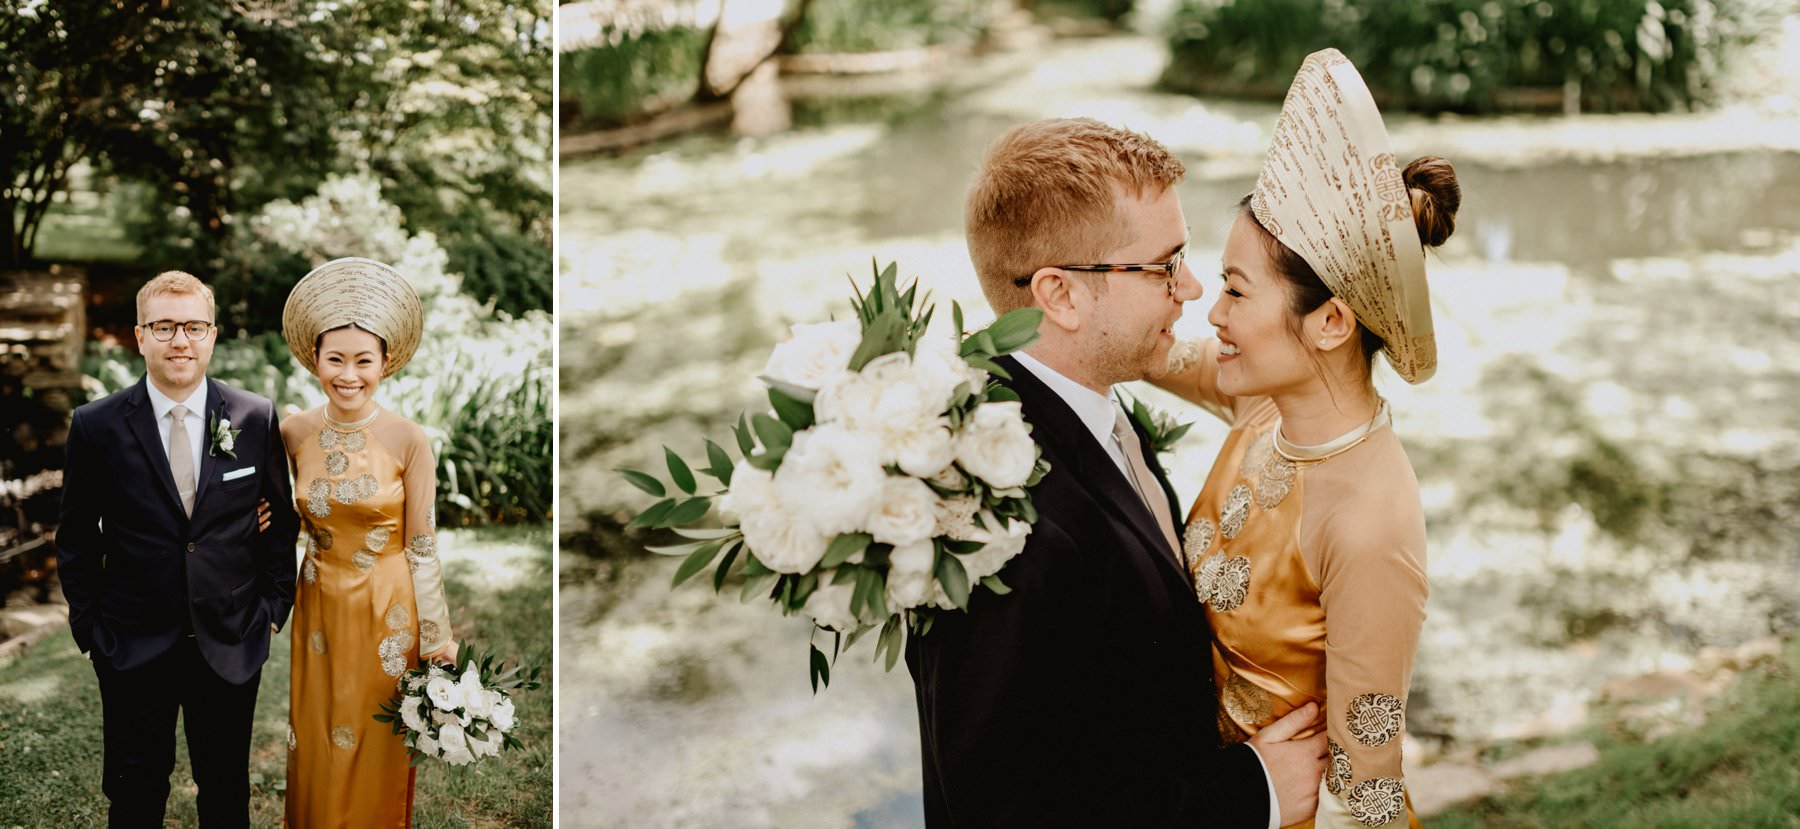 Appleford-estate-wedding-25.jpg